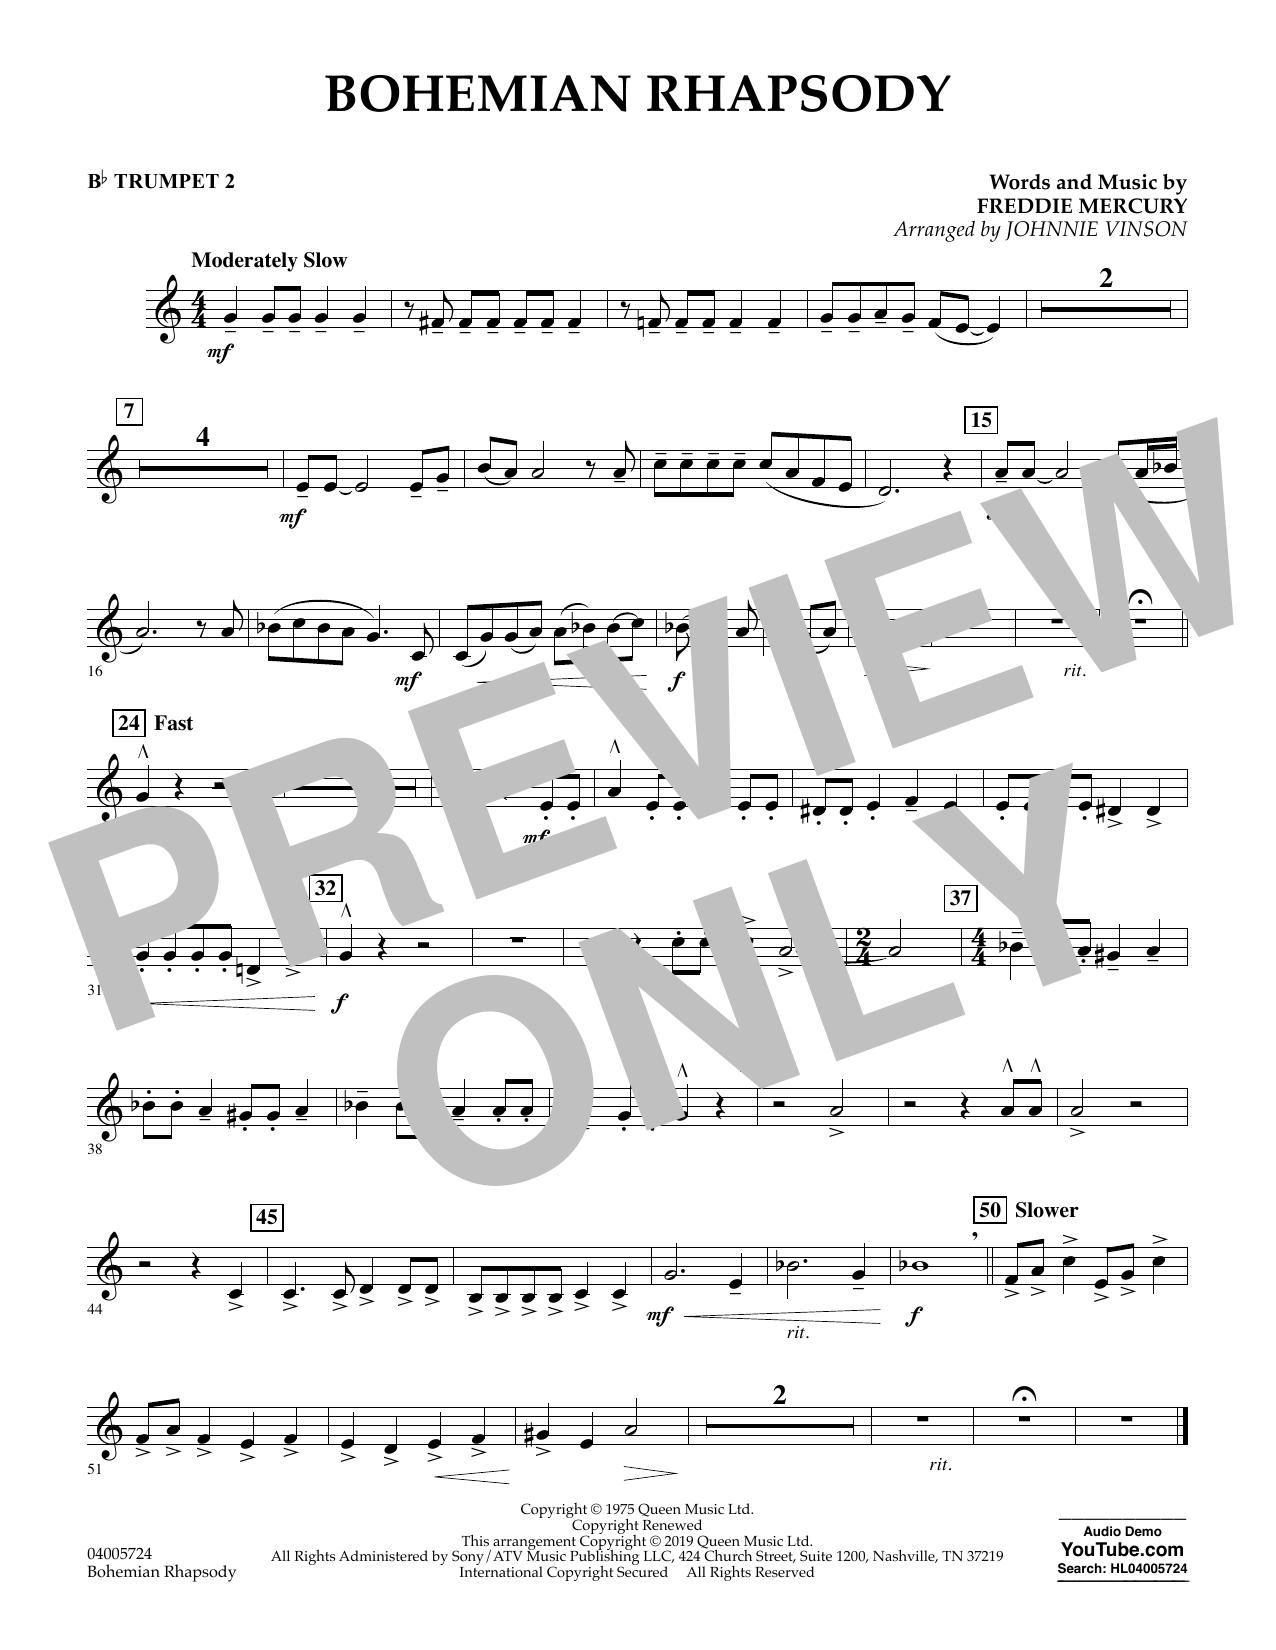 Bohemian Rhapsody (arr. Johnnie Vinson) - Bb Trumpet 2 (Concert Band)